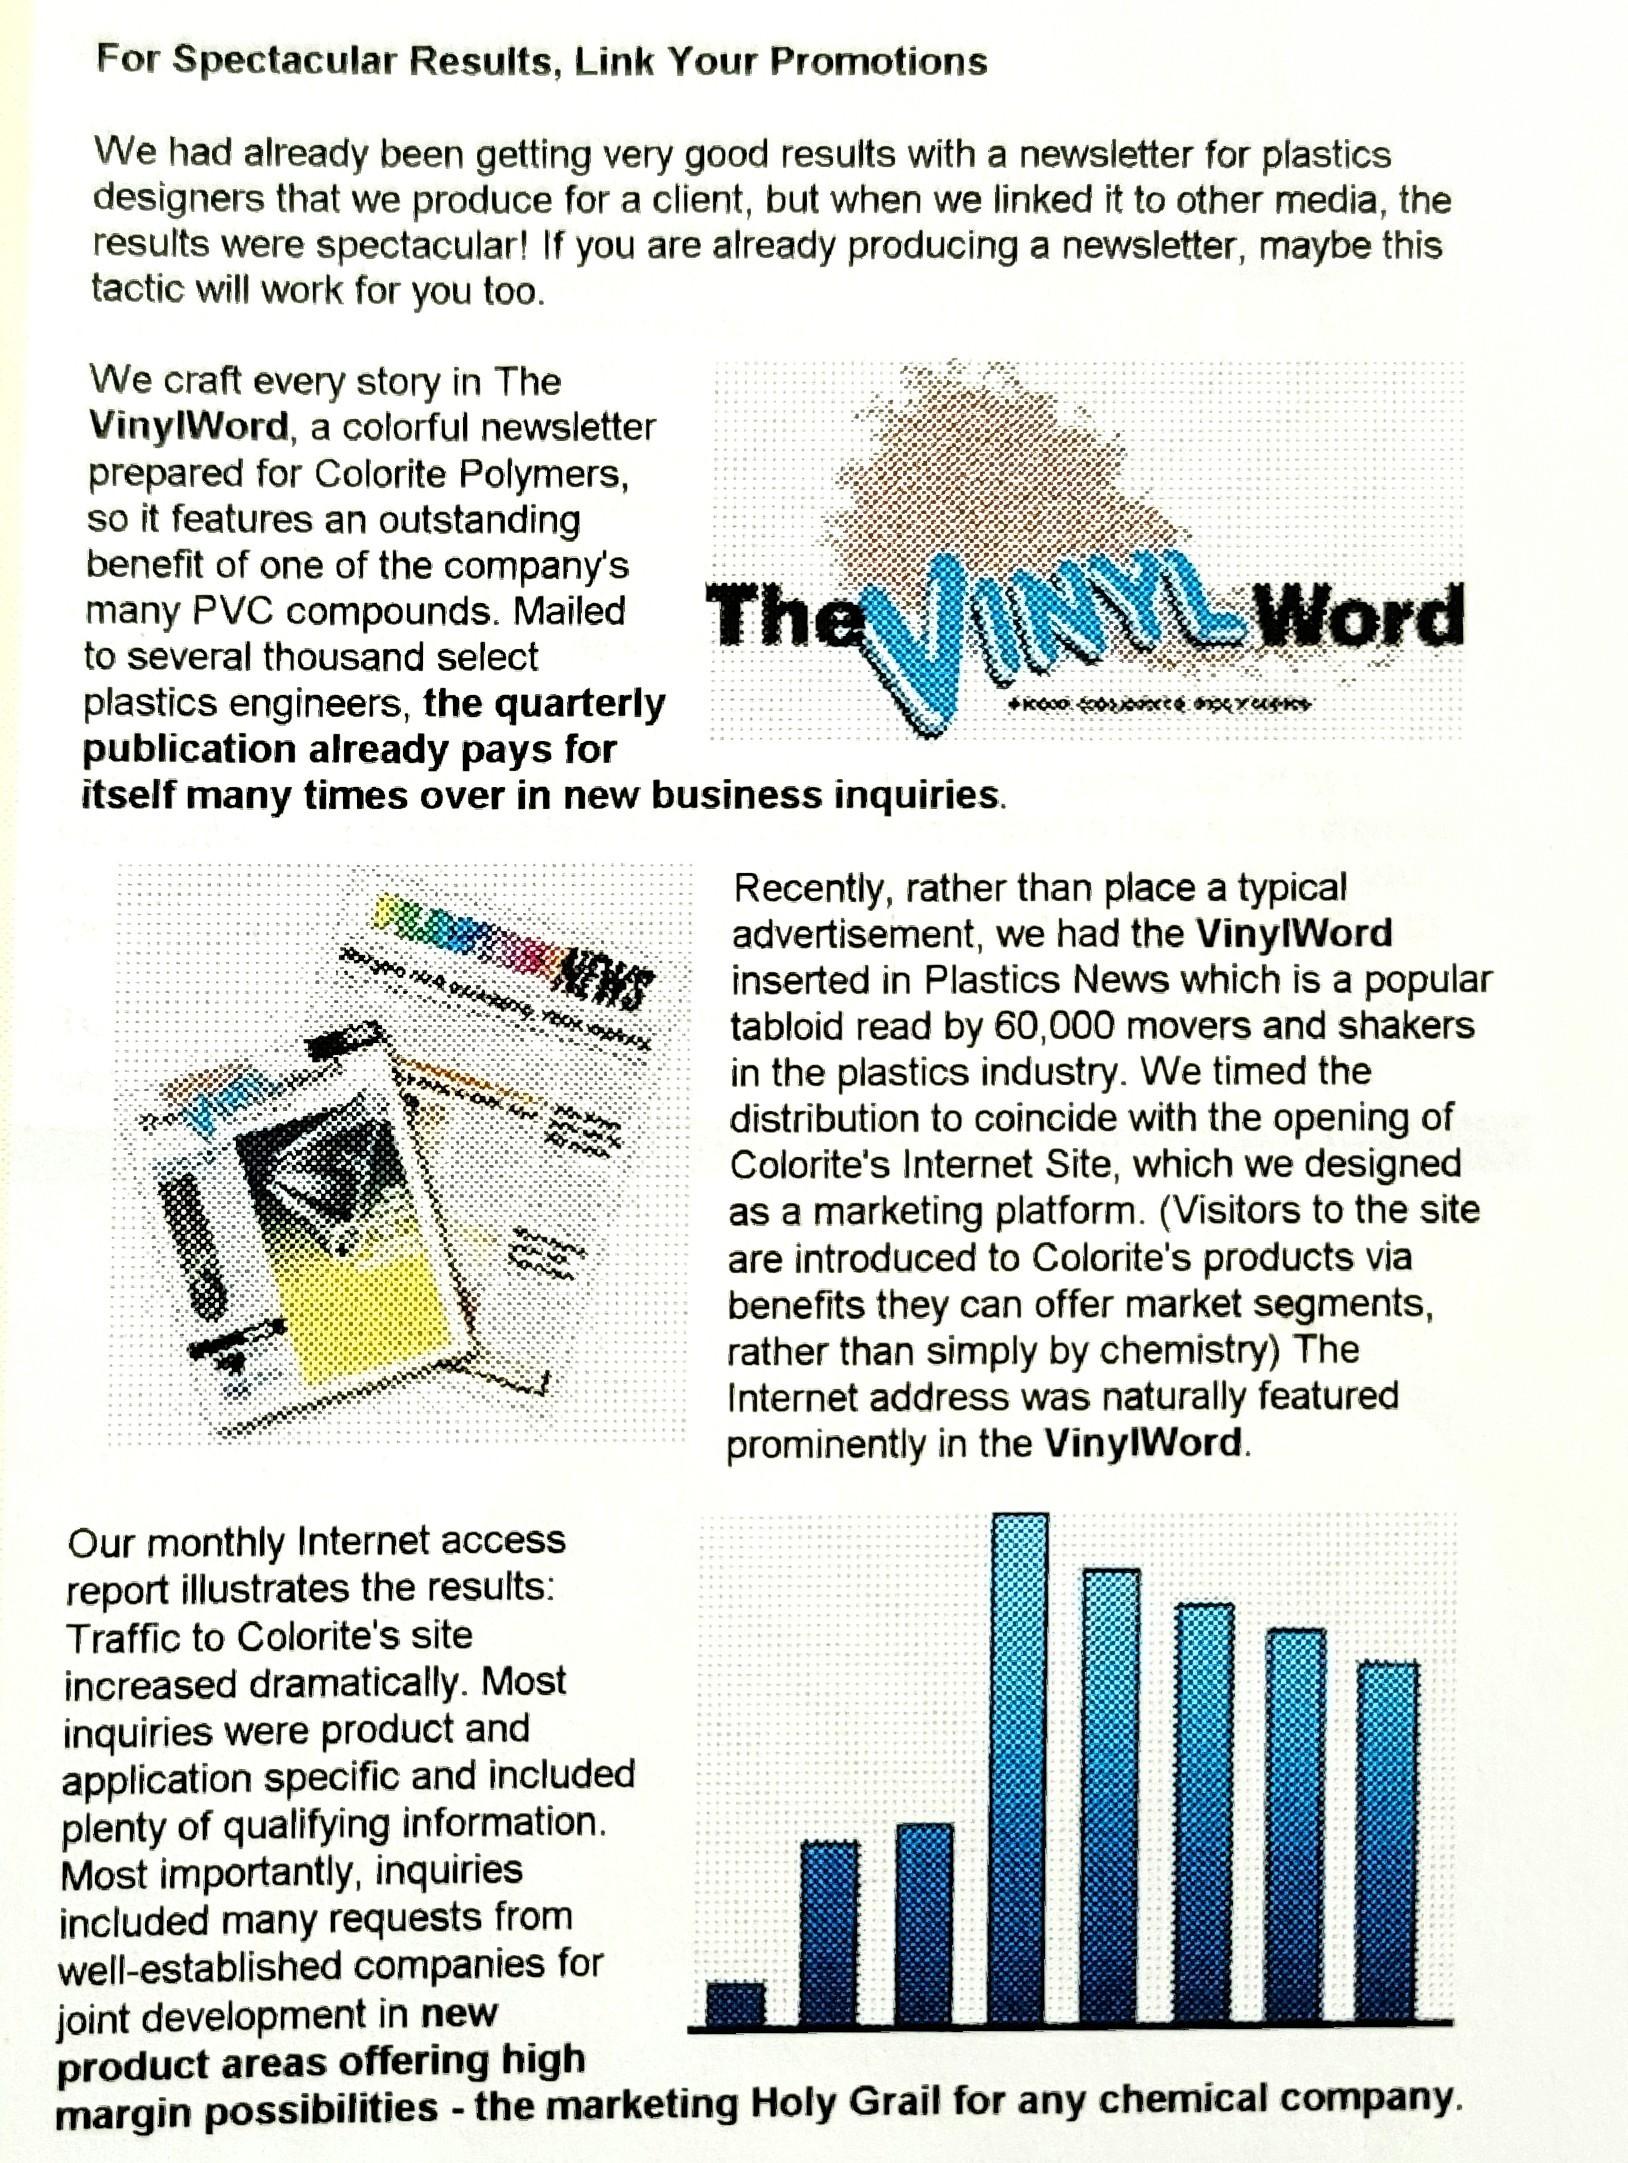 colorite_blog_the vinyl word newsletter_15